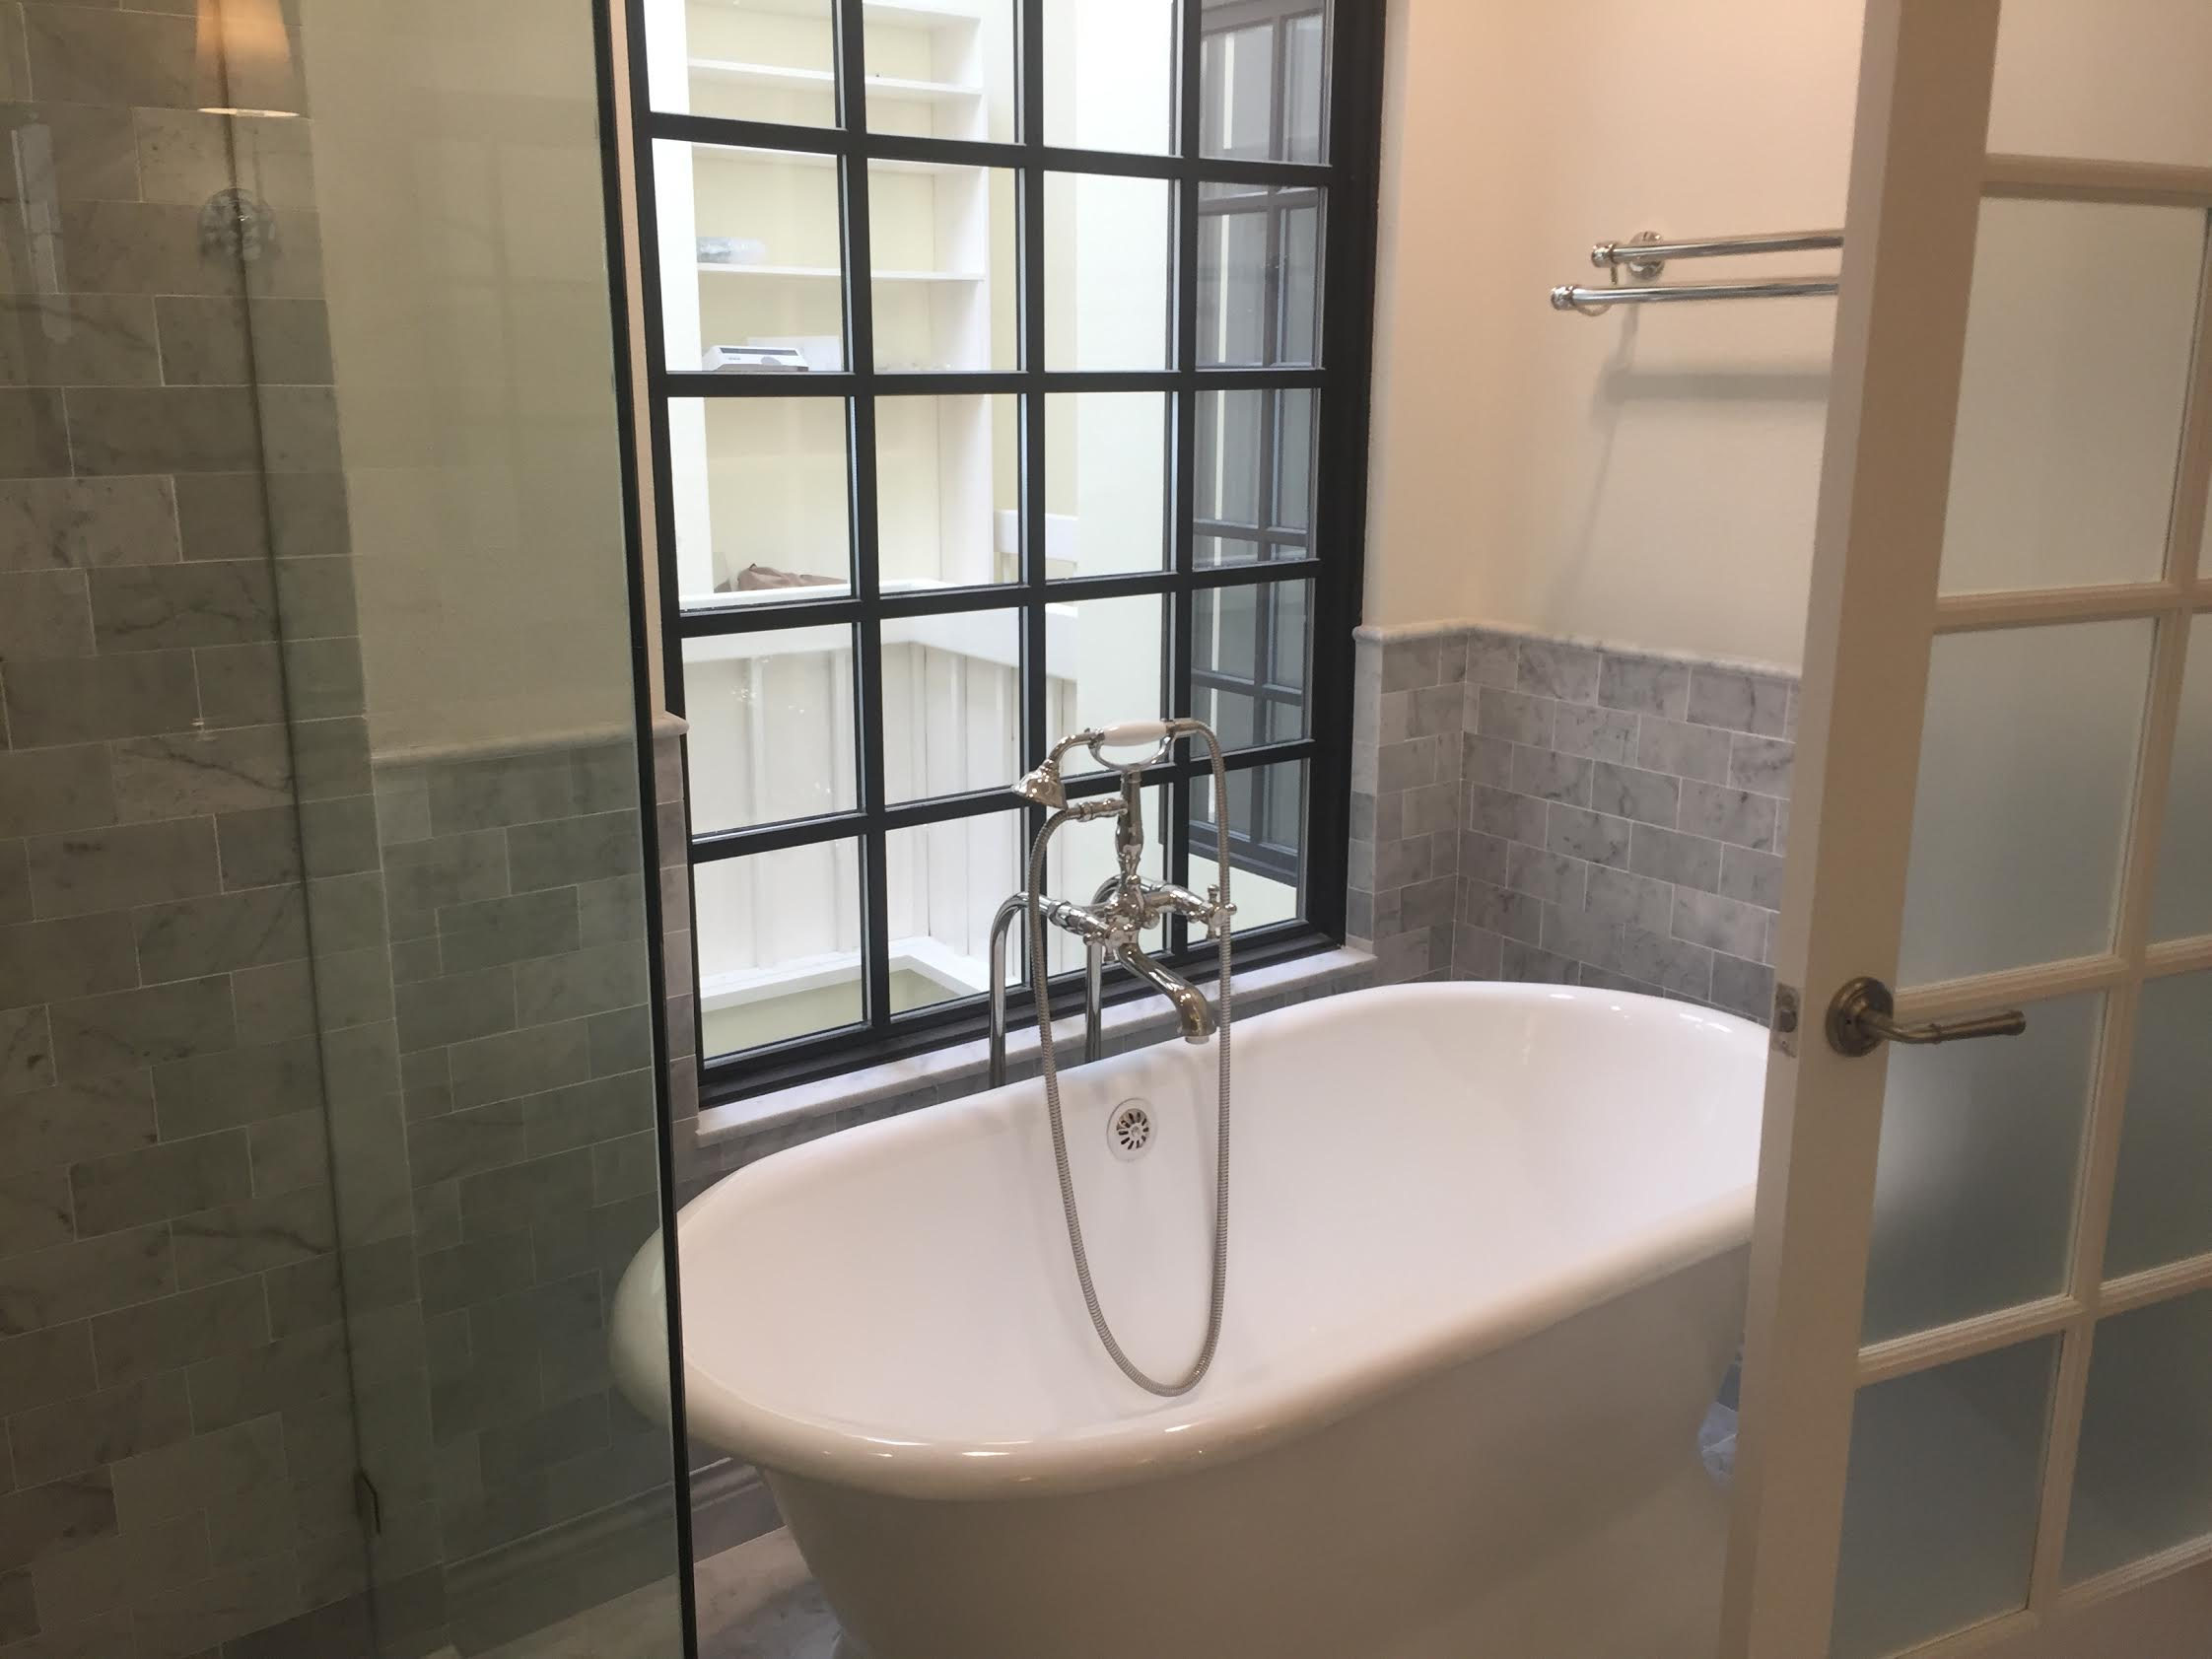 Freestanding Tub Master Bathroom Pacific Palisades | Eden Builders